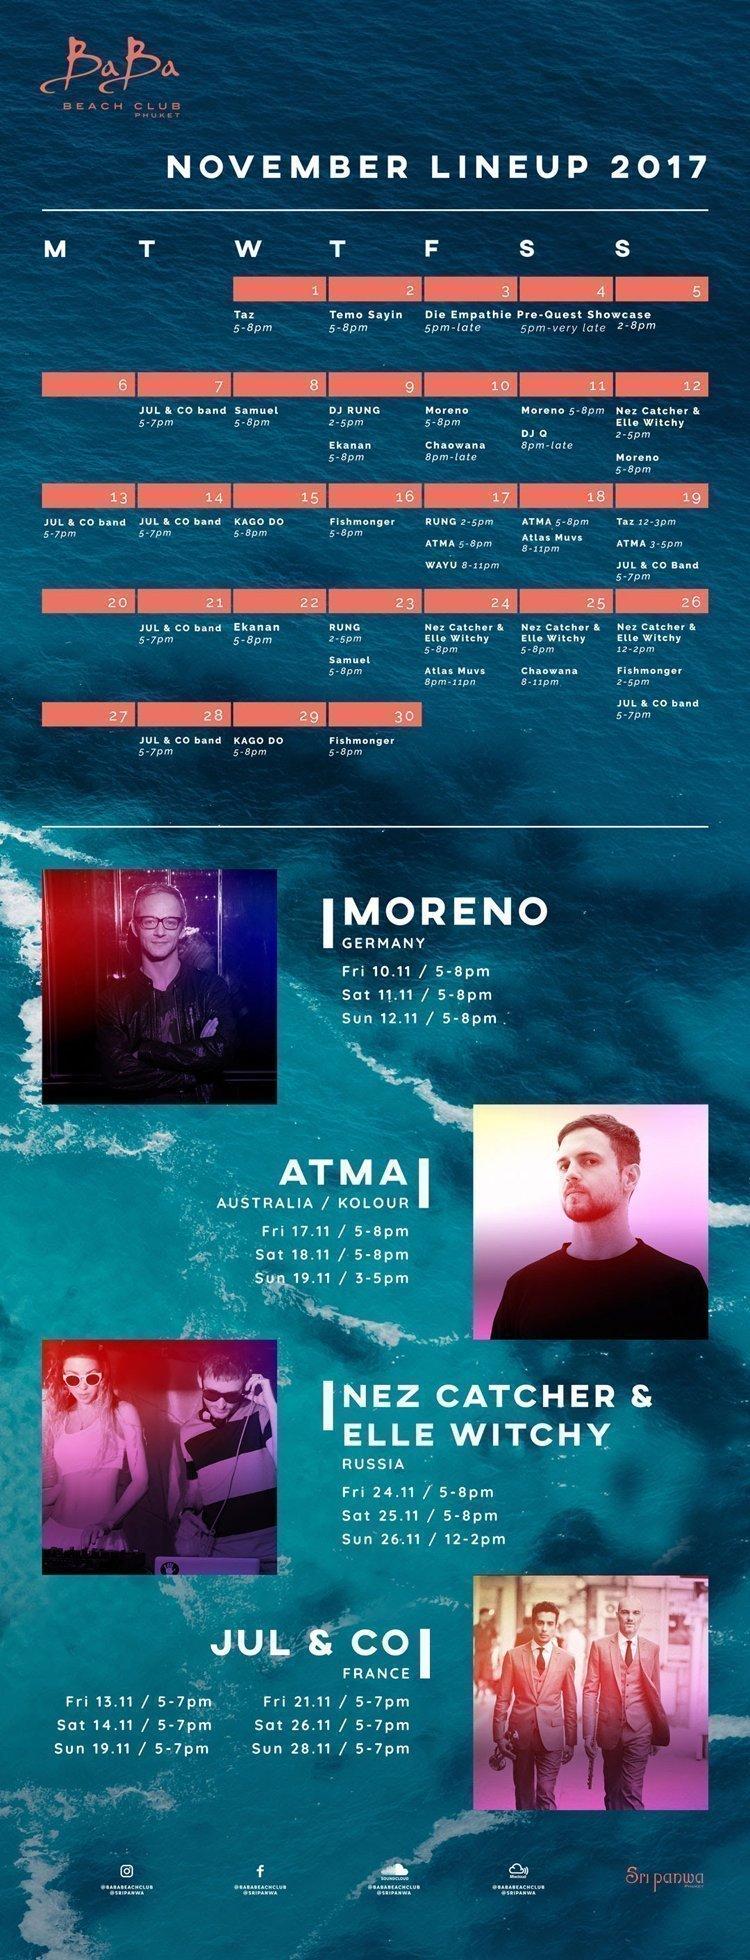 Baba Beach Club Phuket presents DJ's & Entertainment lineup in November